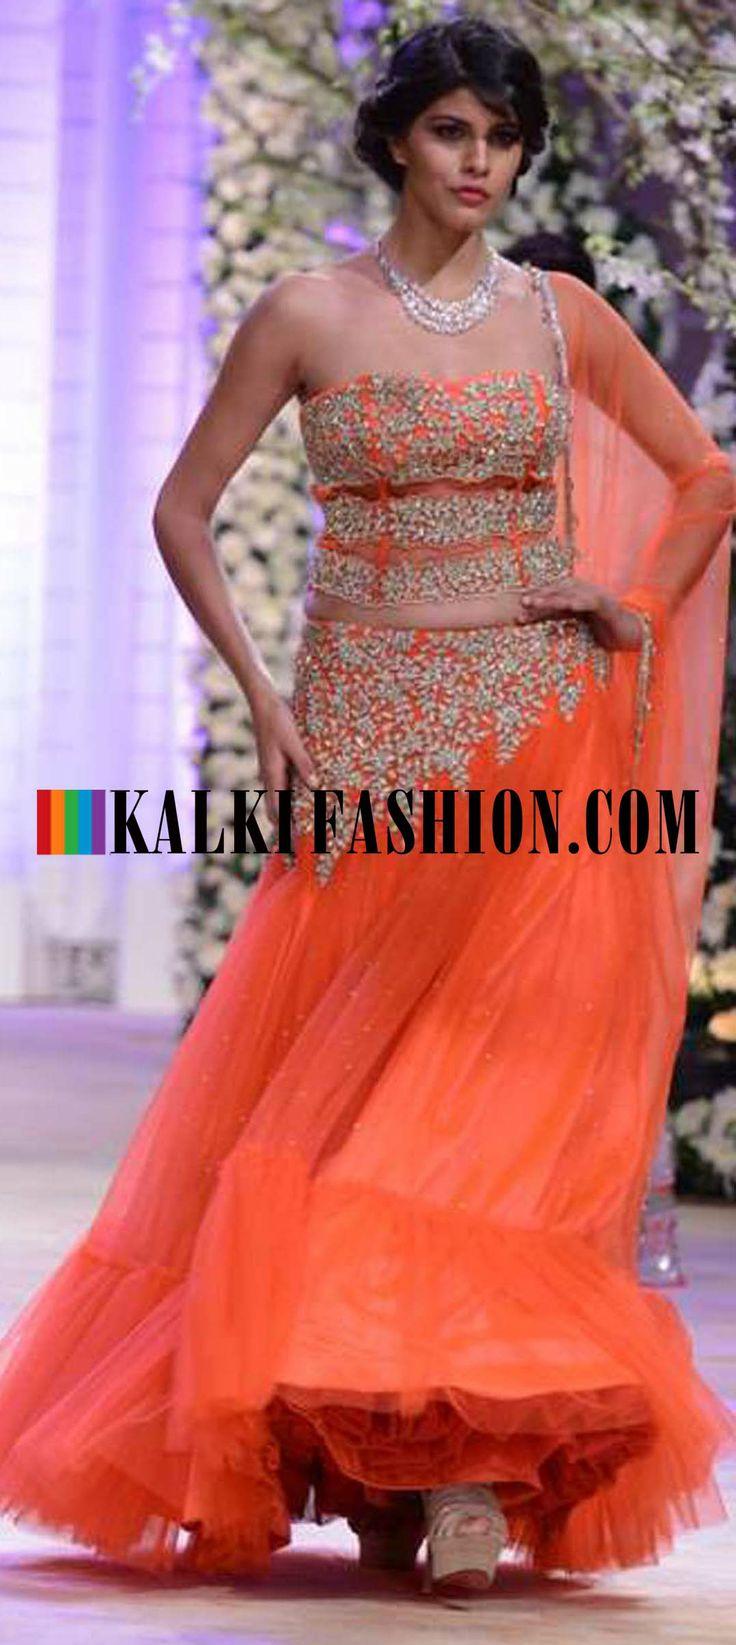 http://www.kalkifashion.com/designers/jyotsna-tiwari.html Urnashi Rautela and other models walk the ramp for Jyotsna Tiwari at Indian Bridal Week NOV 2013 at Mumbai 51